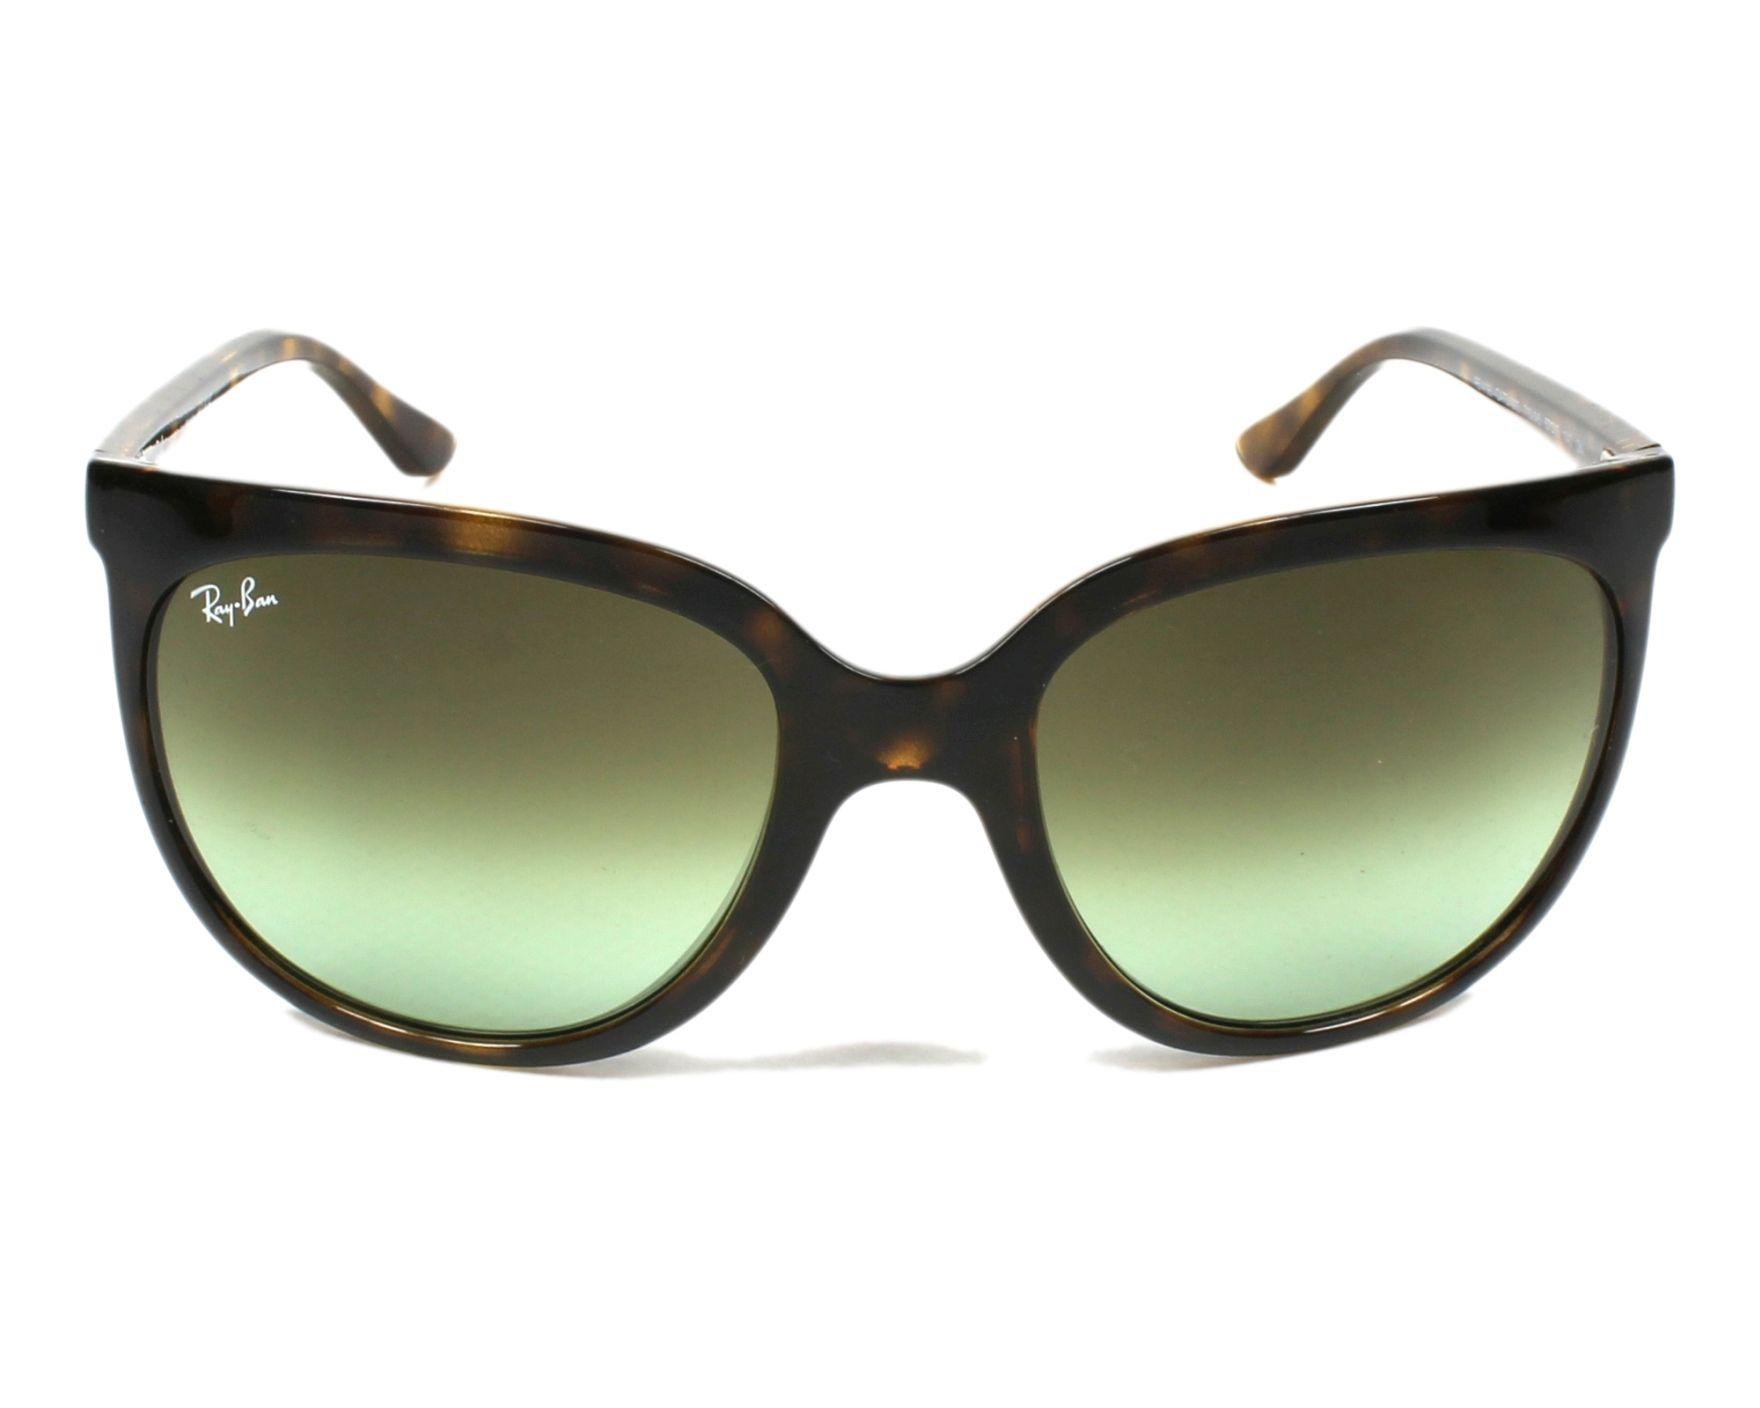 fe8bf622c8bda ... cats 1000 sunglasses tortoise frame pink coupon sunglasses ray ban rb  4126 710 a6 57 15 havana front view f8a91 5da4b ...